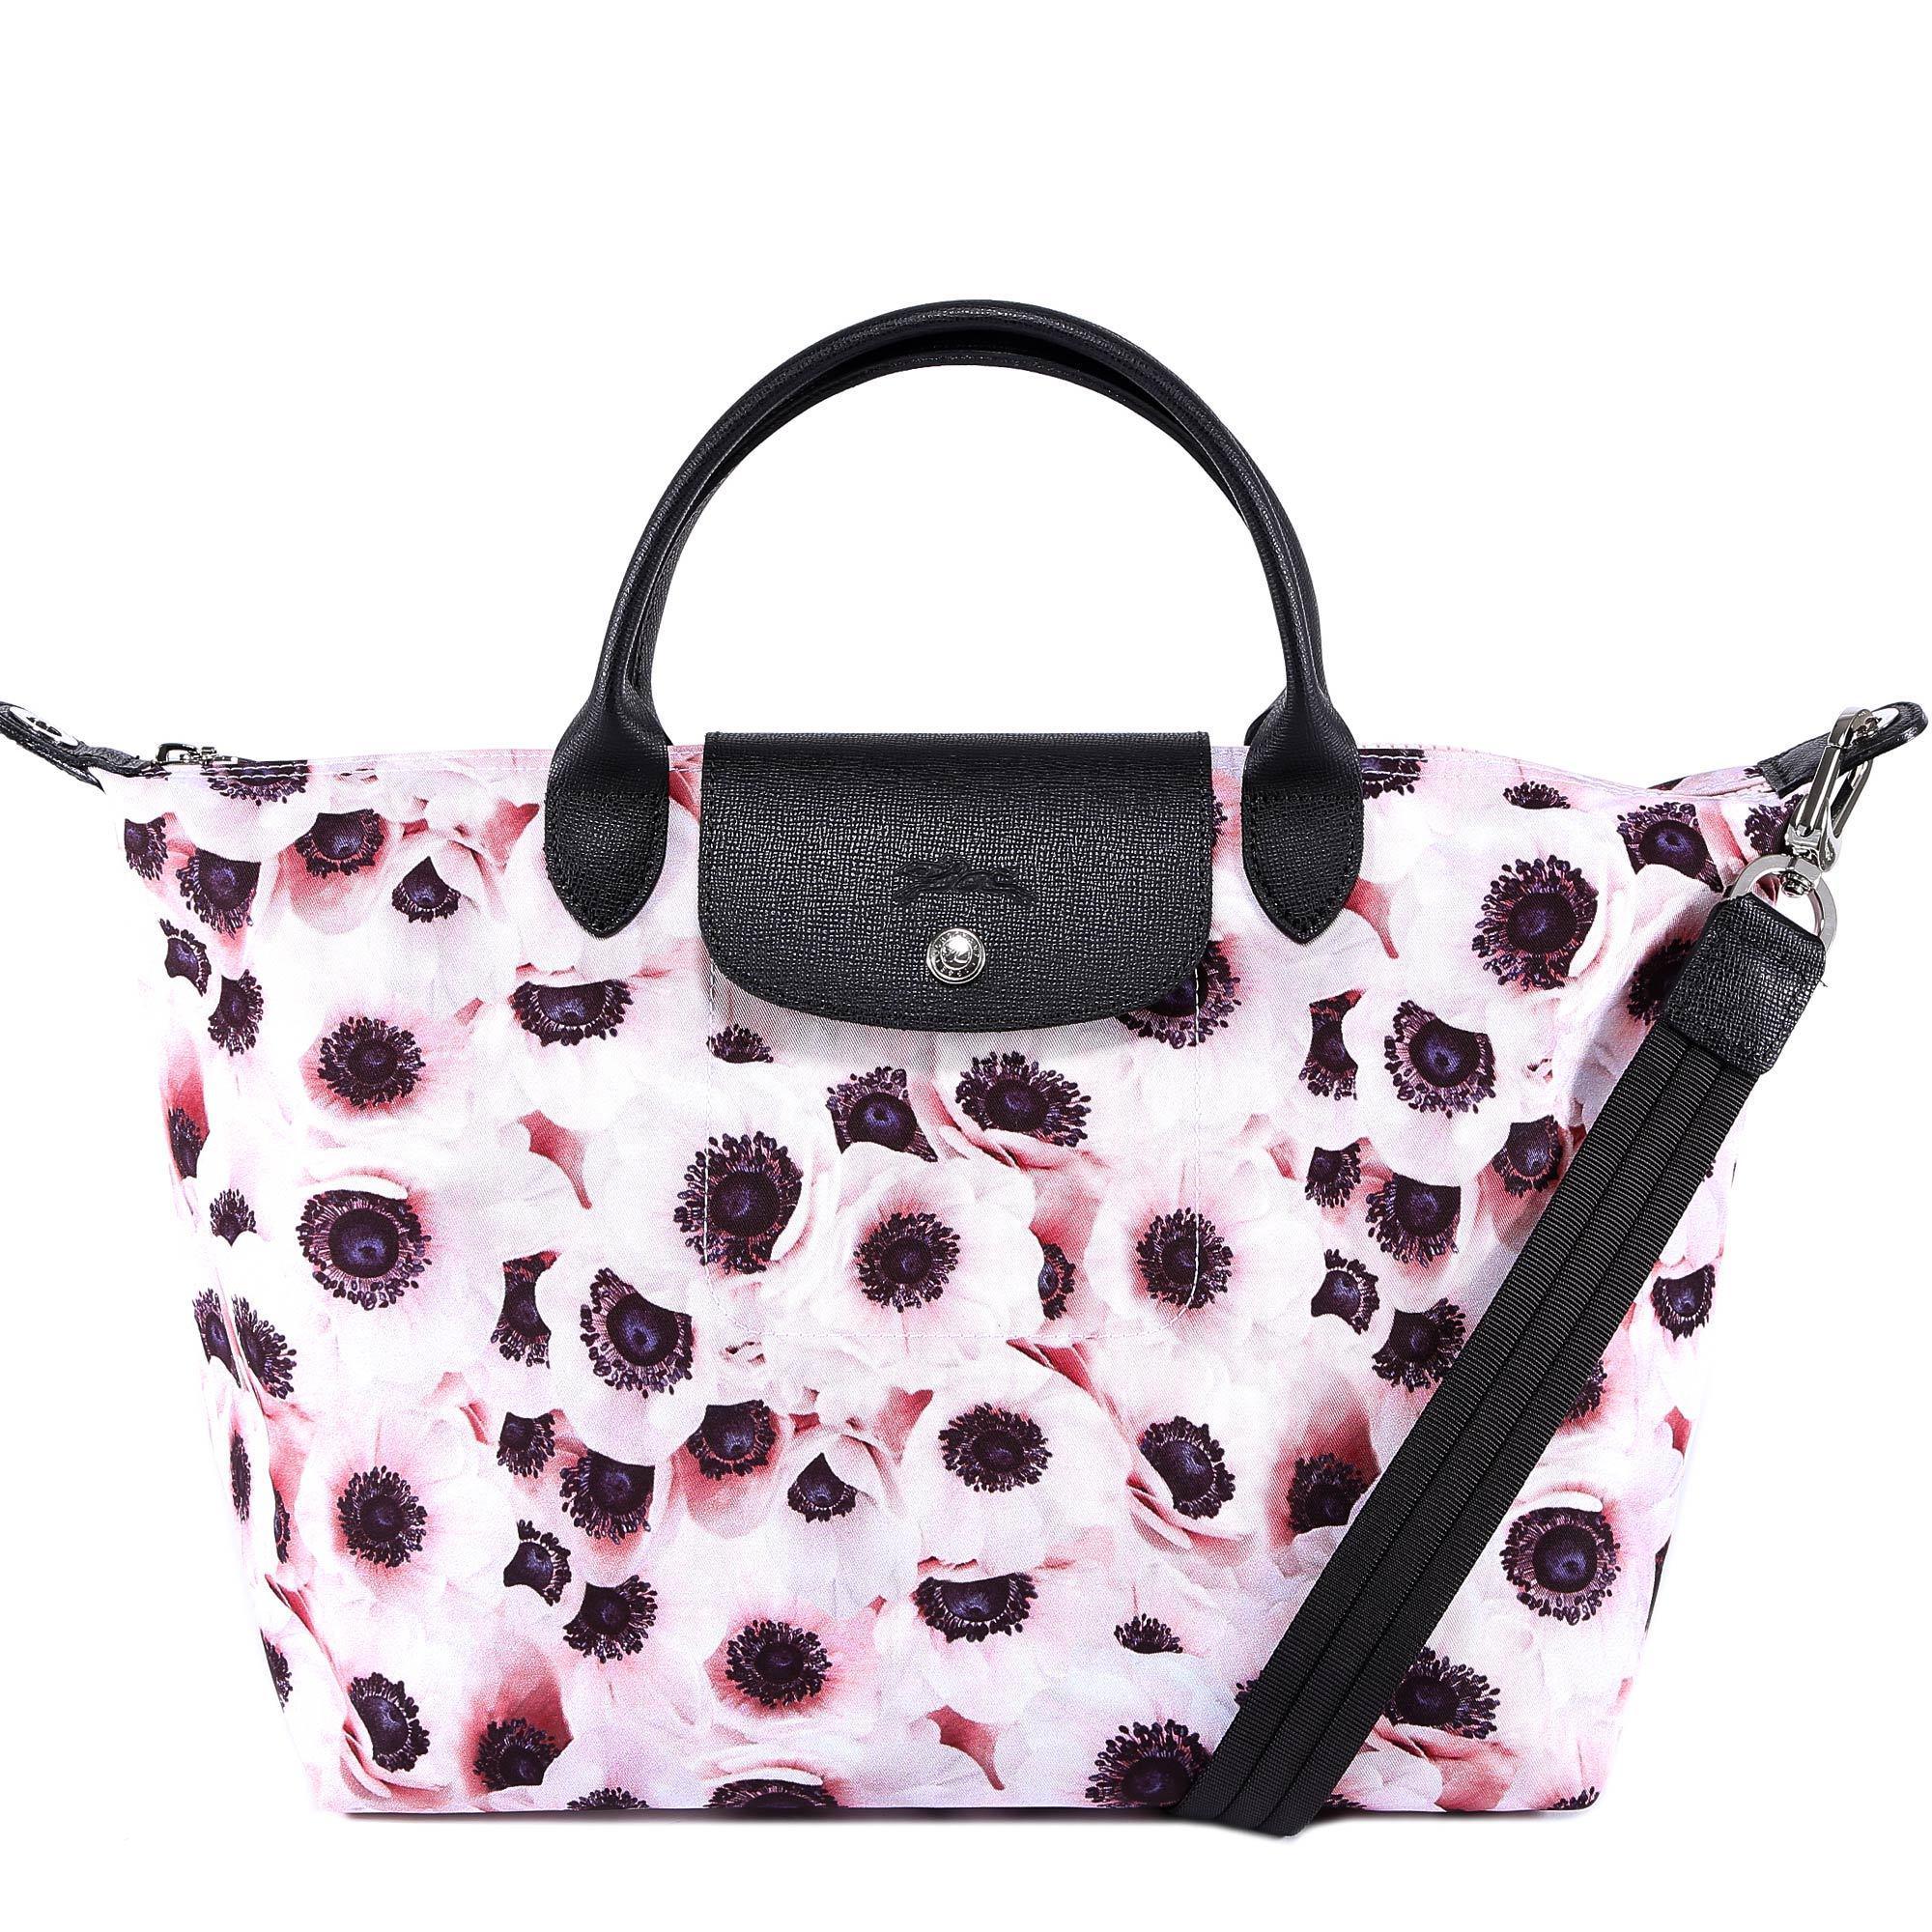 Longchamp Poppy Print Le Pliage Handbag in Pink - Lyst e10b91a25f0ae